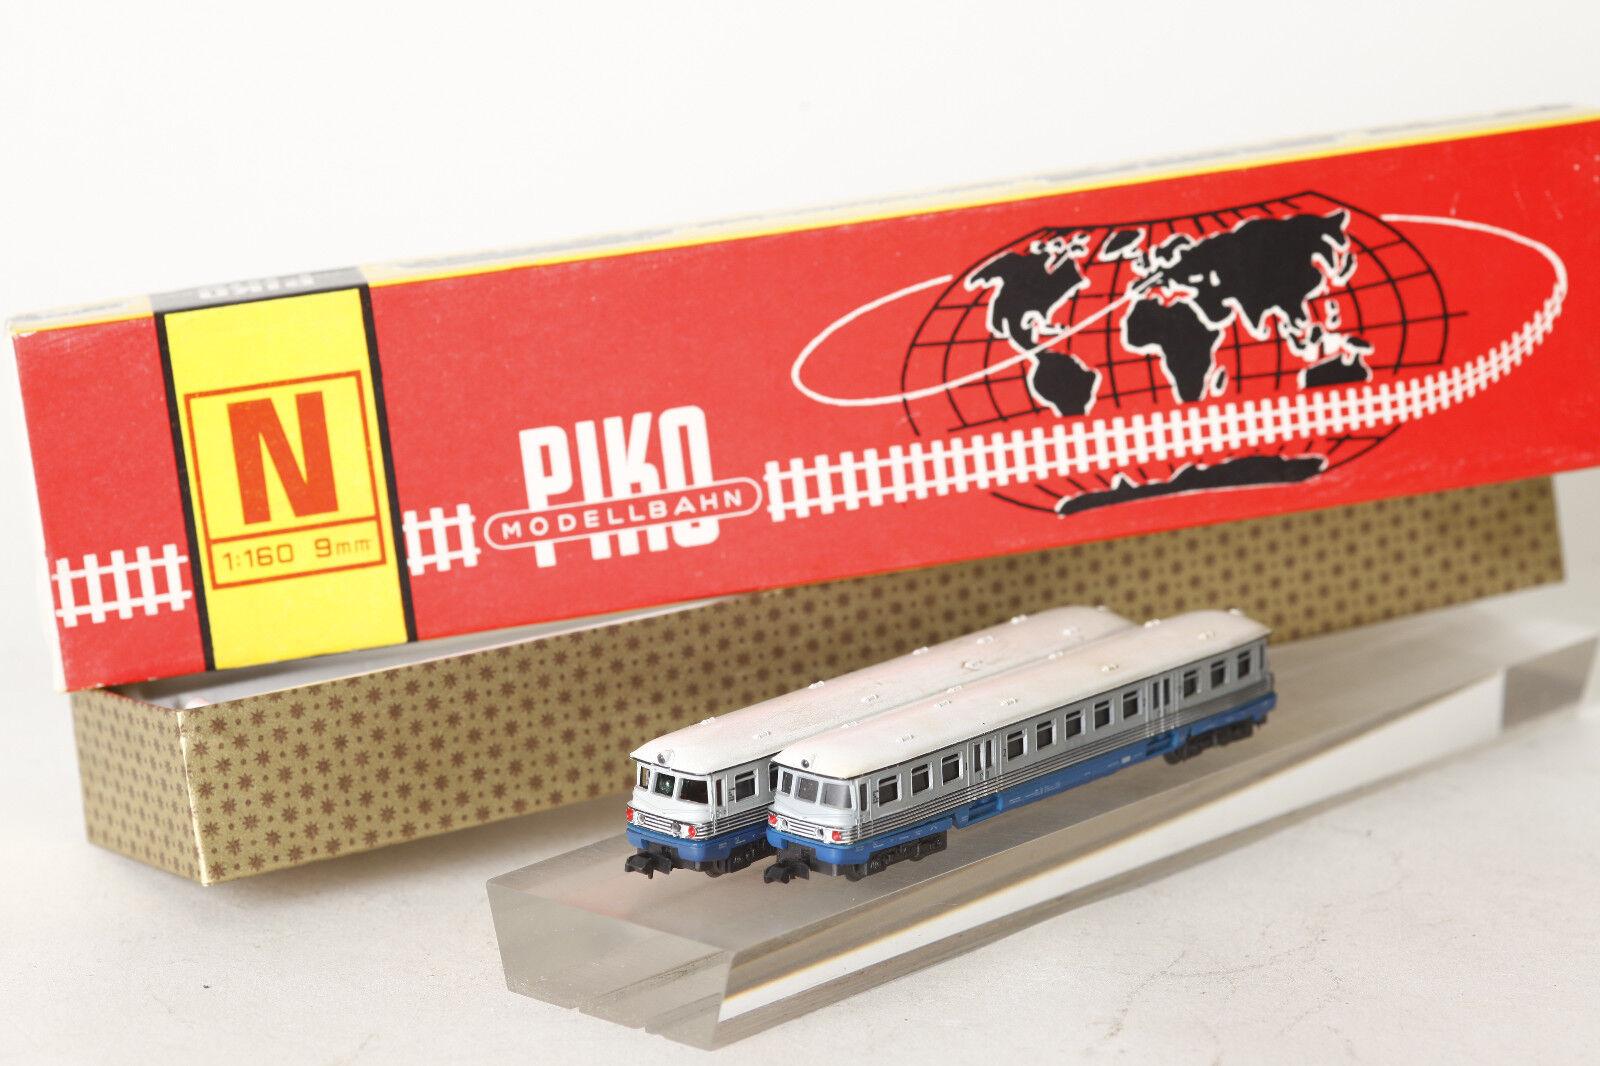 Piko Scala N Leichttriebwagen Bd 465-1 e Sidecar Scatola Originale  101242